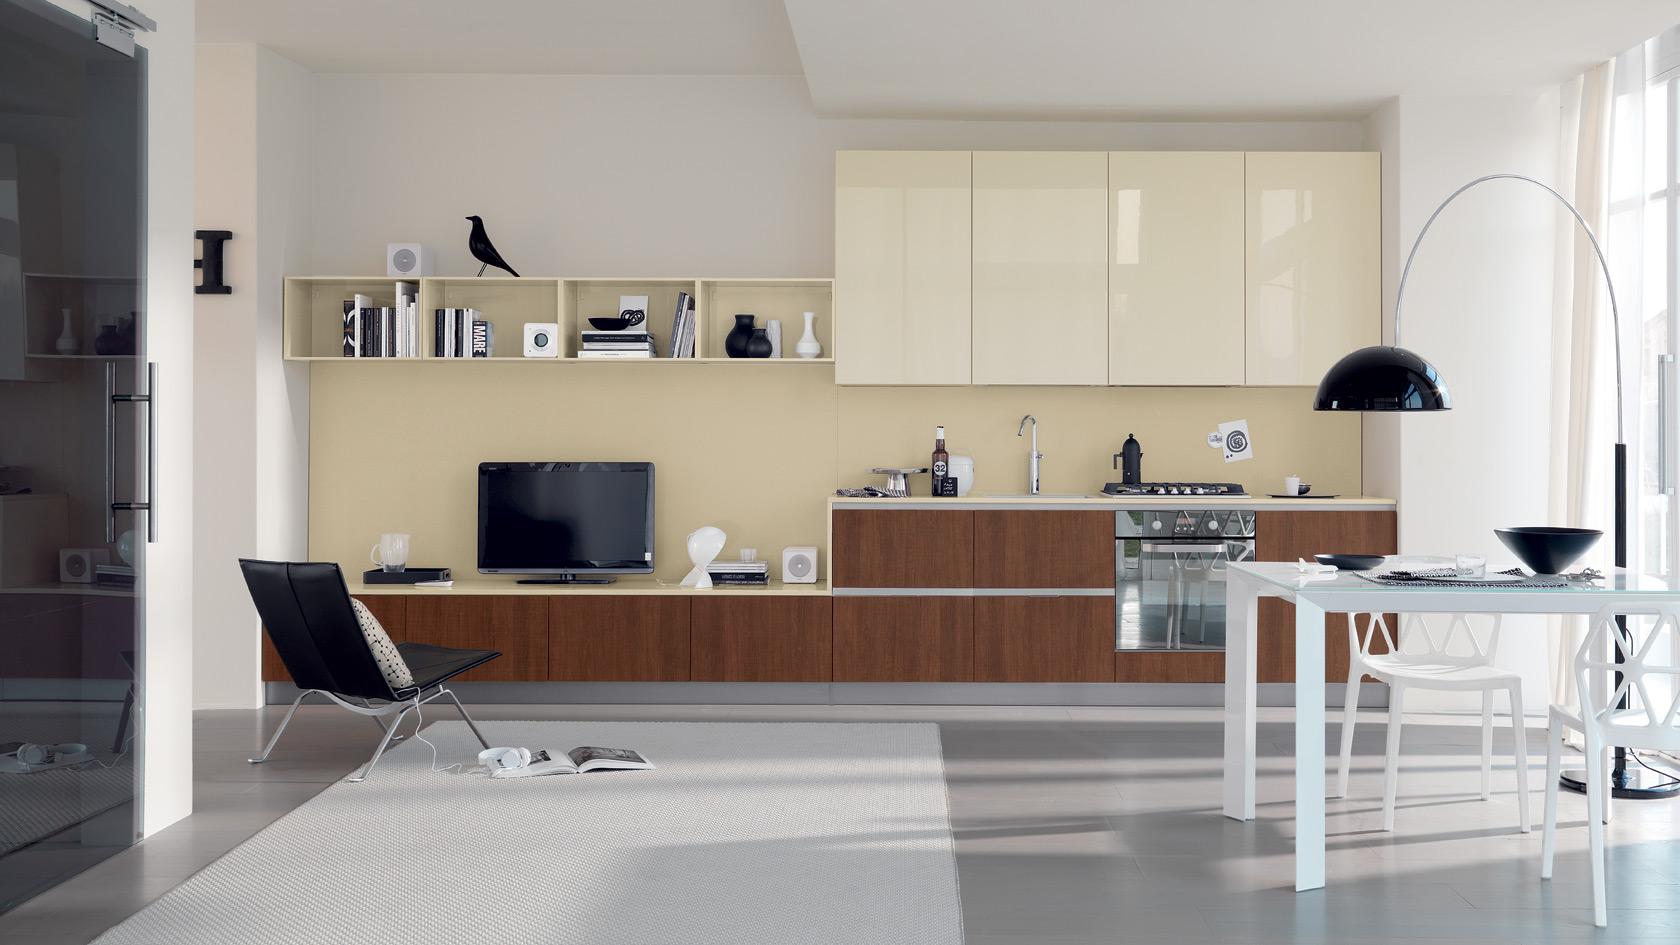 cucina-scavolini-mood-arredamenti-modena-5 - Arredamenti Casarini ...